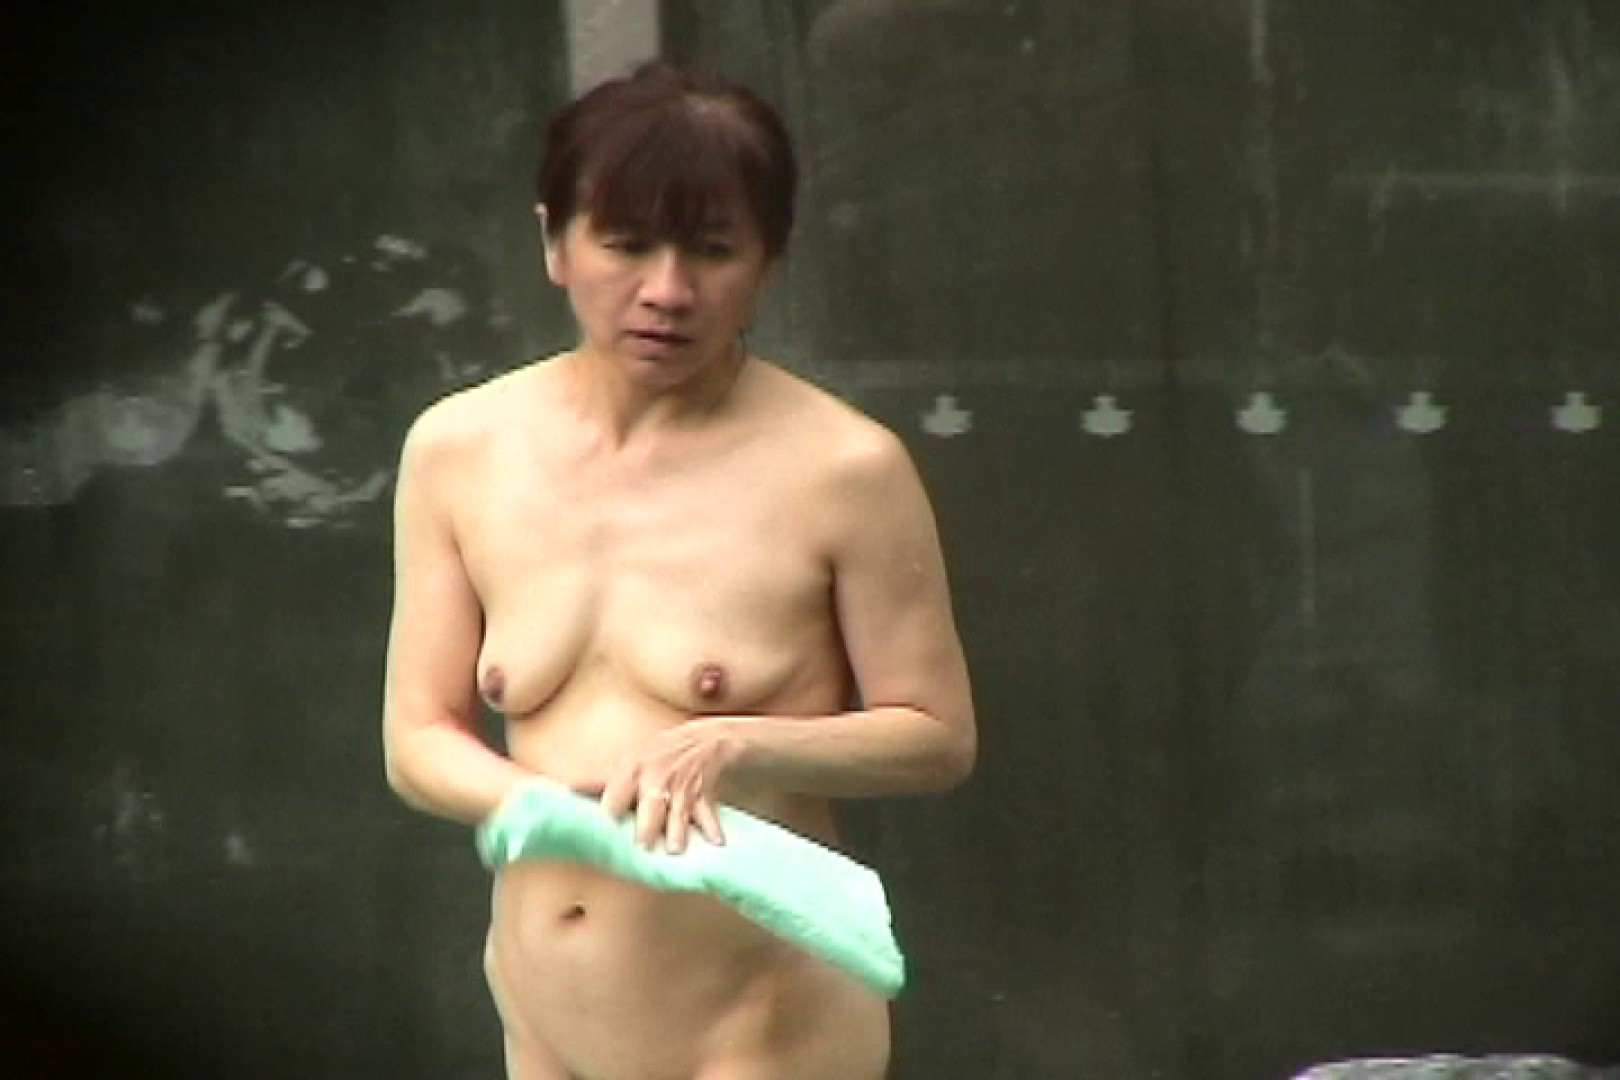 Aquaな露天風呂Vol.456 盗撮 | HなOL  102pic 37